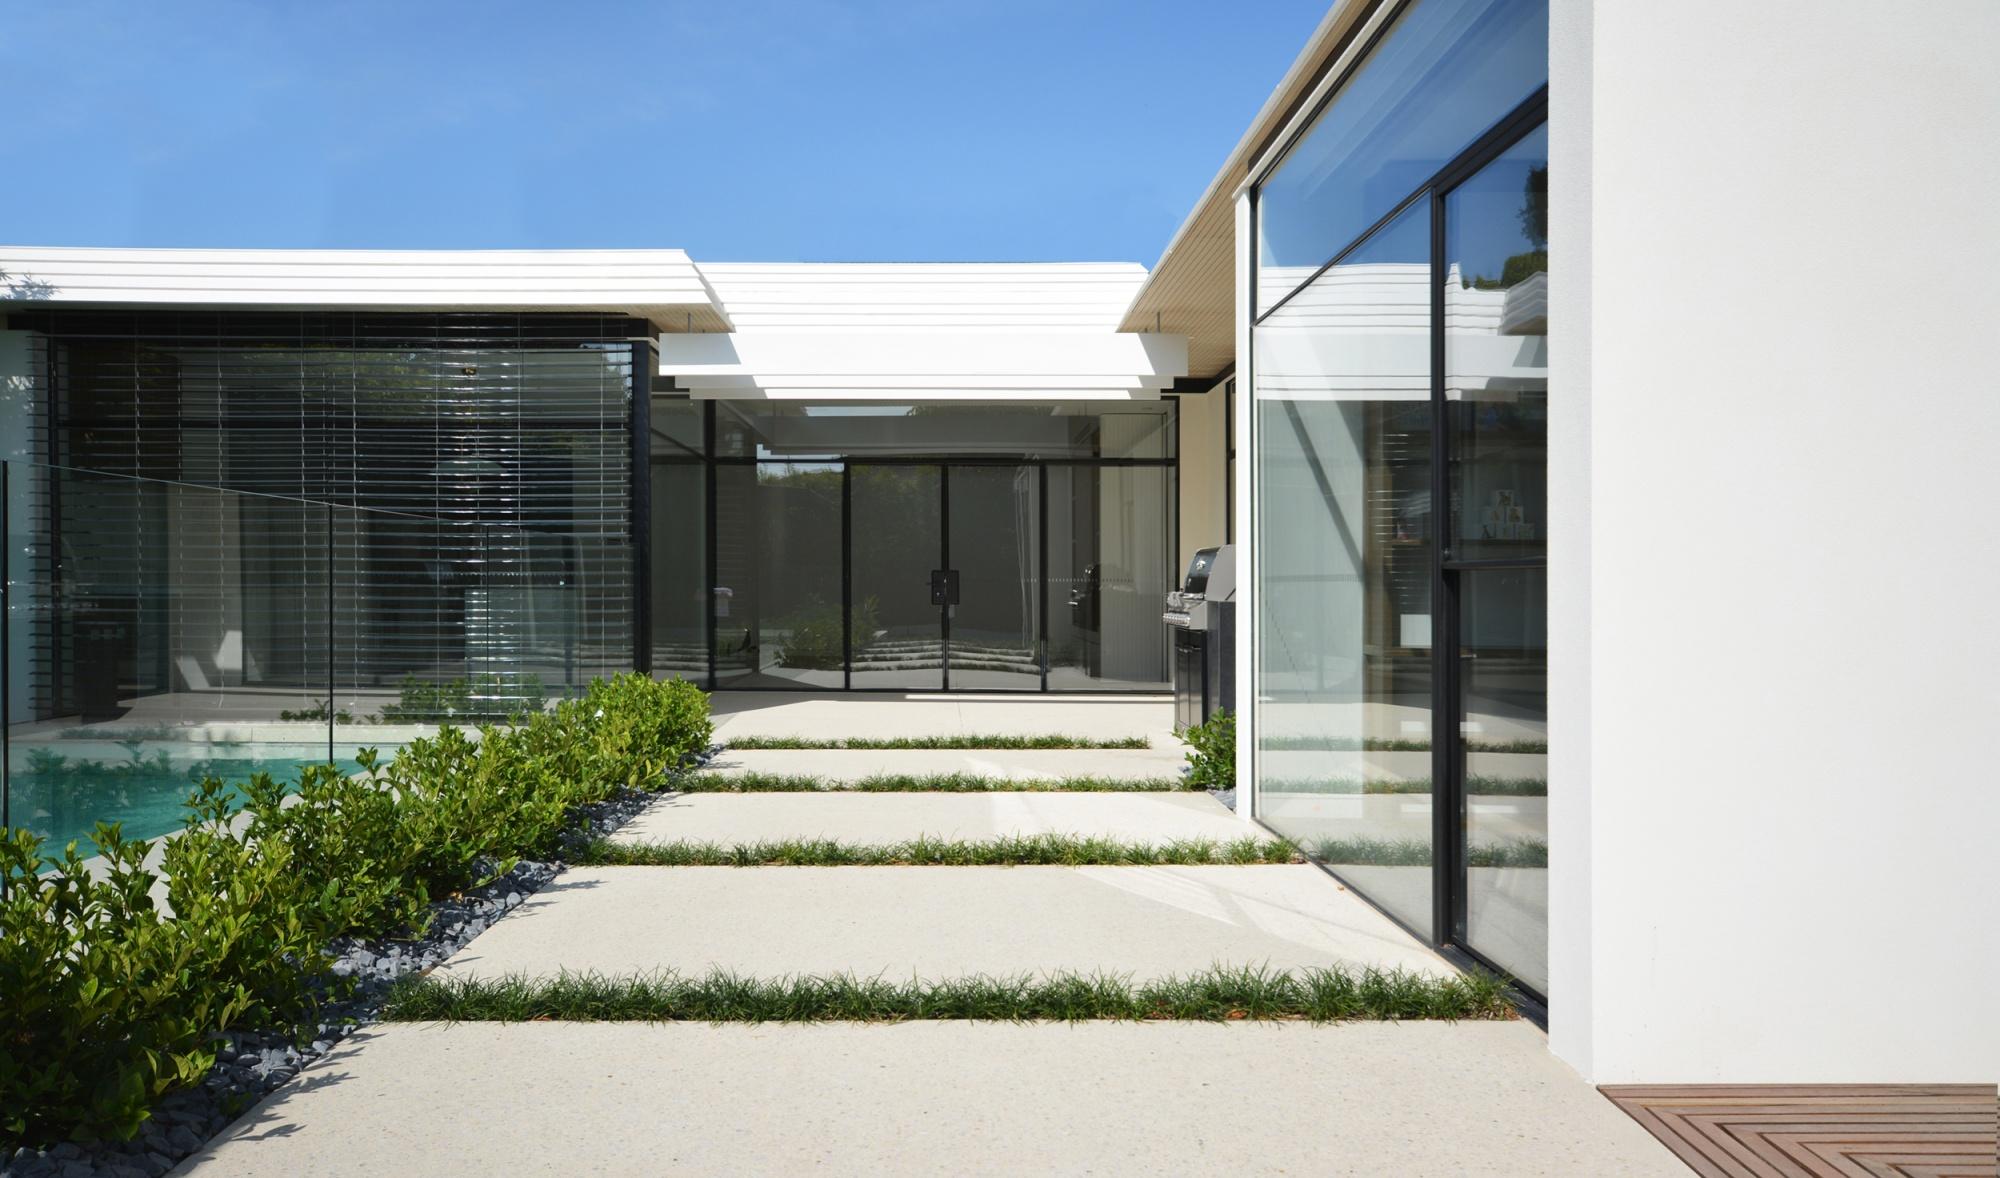 Mid Century Modern-Tecture-The Local Project-Australian Architecture & Design-Image 2